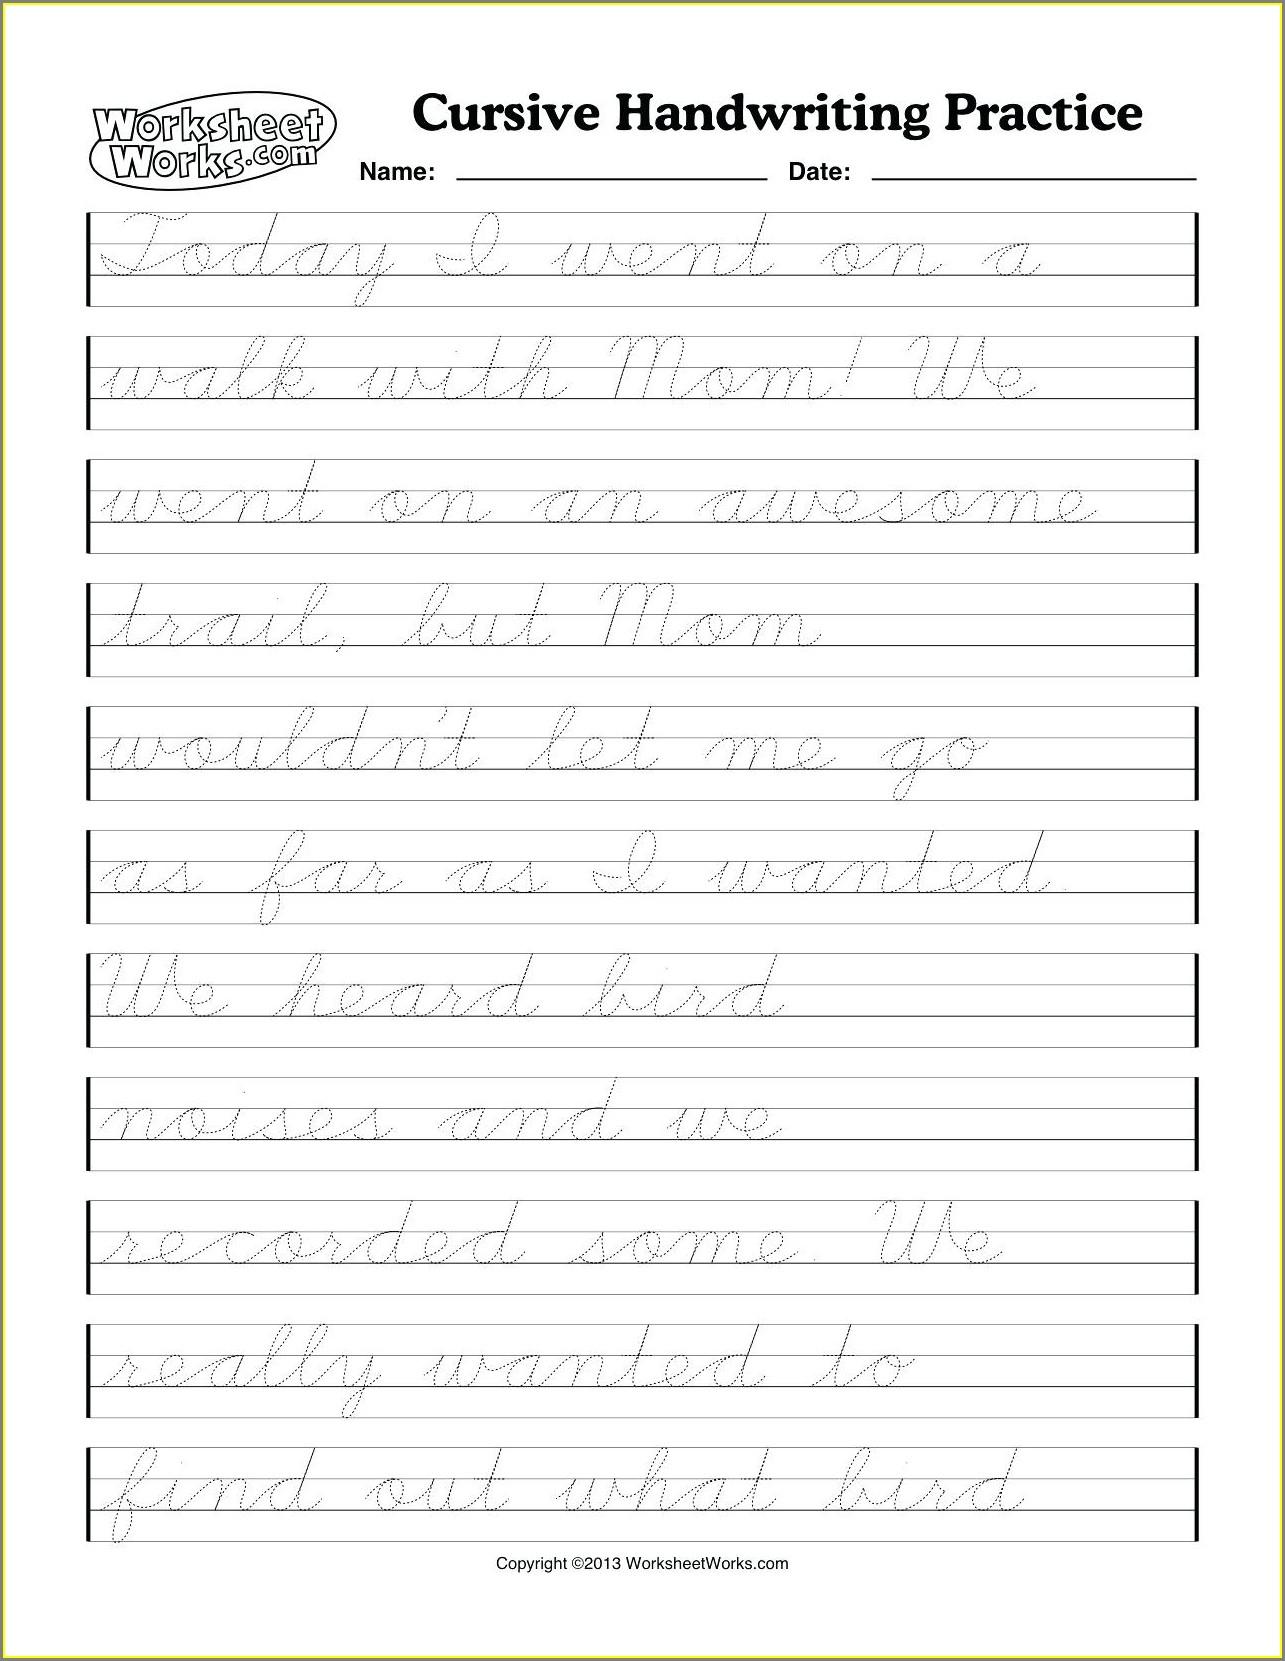 Handwriting Worksheet Generator Software